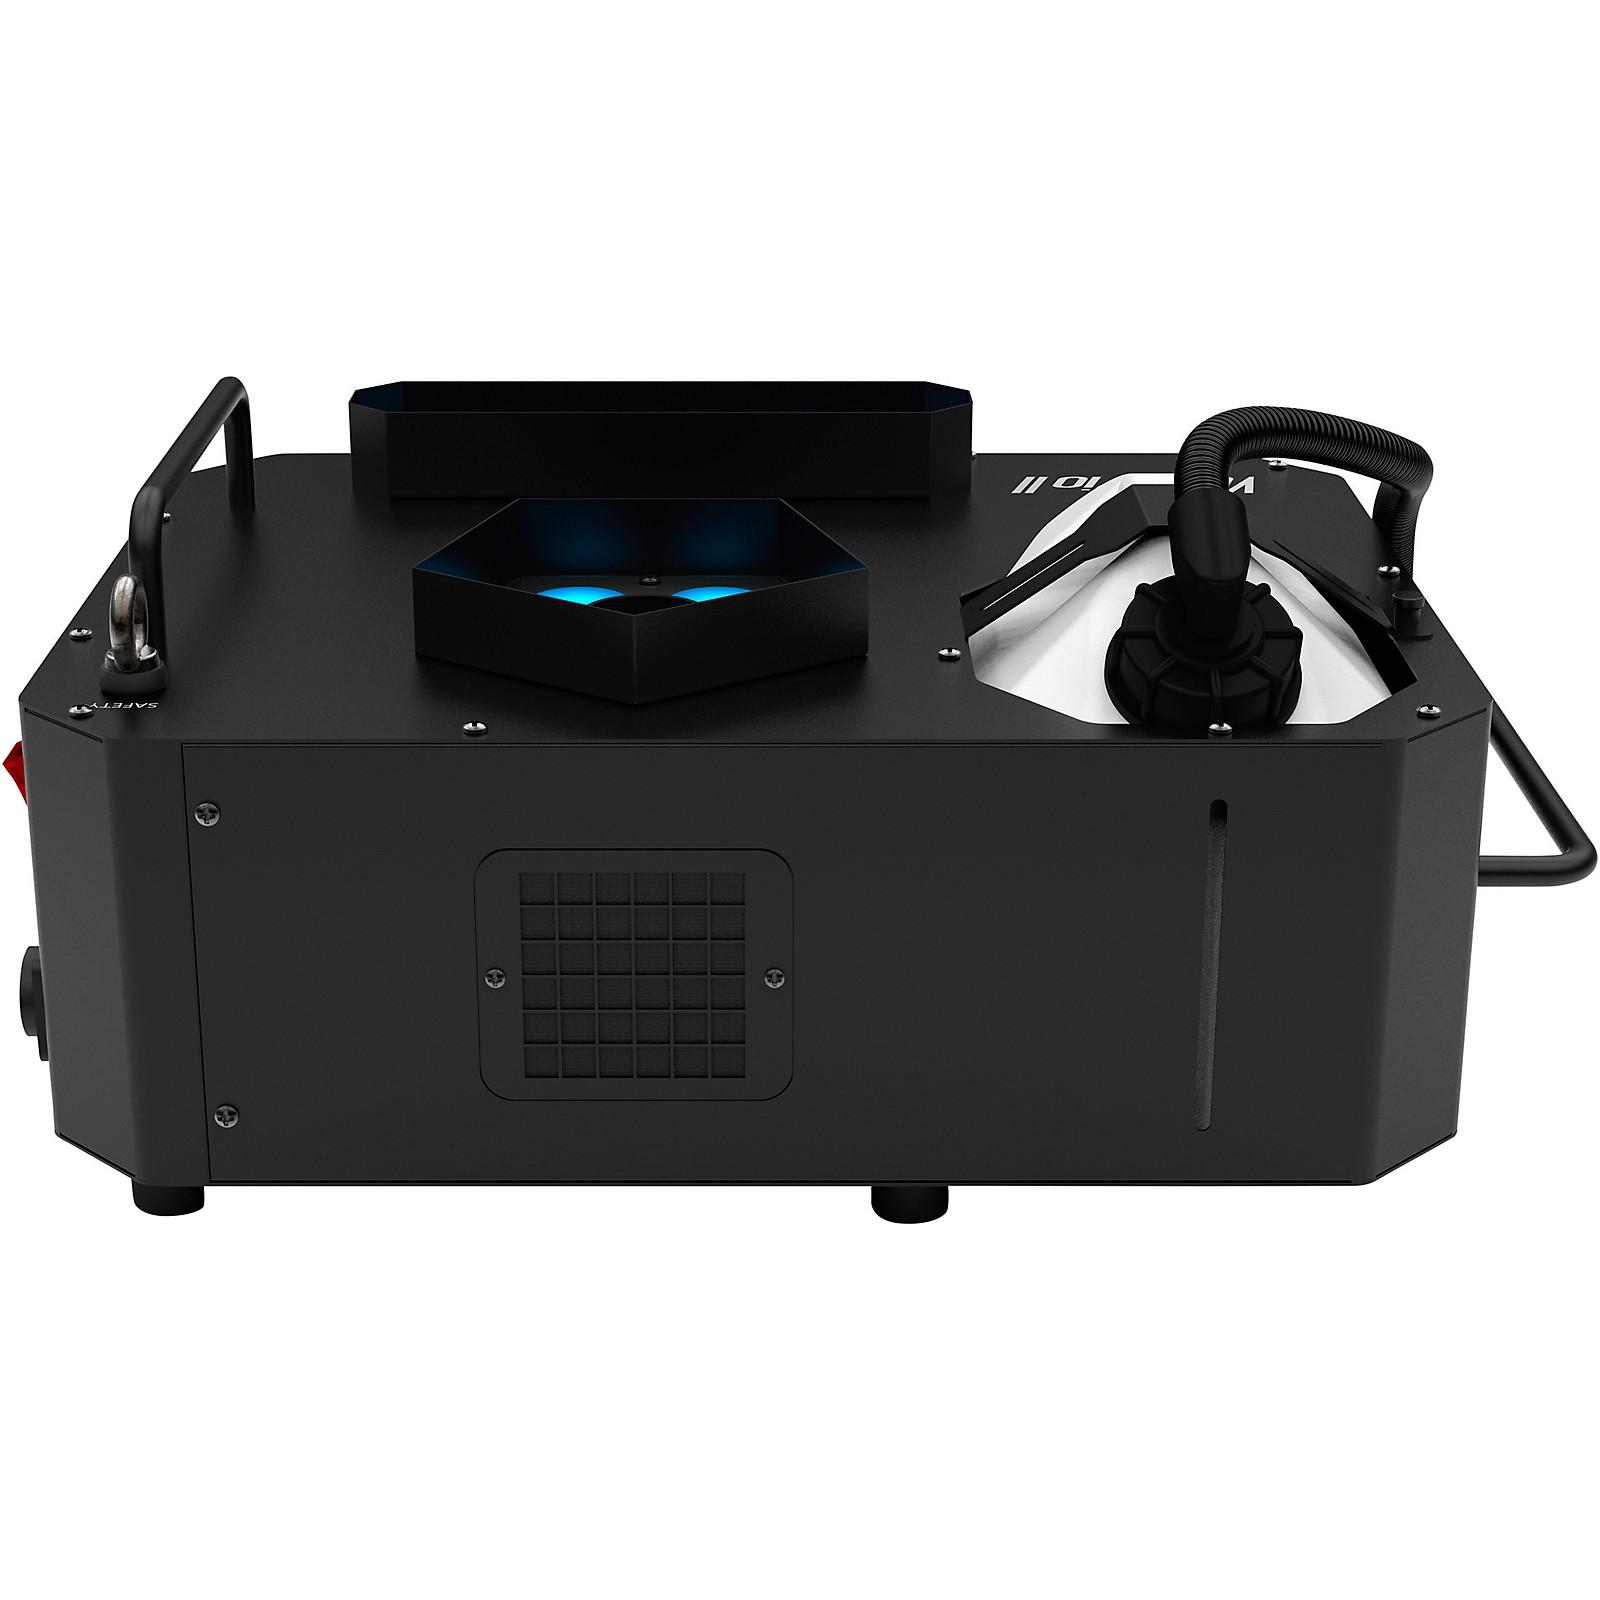 CHAUVET Professional Vesuvio II Fog Machine with RGBA+UV LED Lights